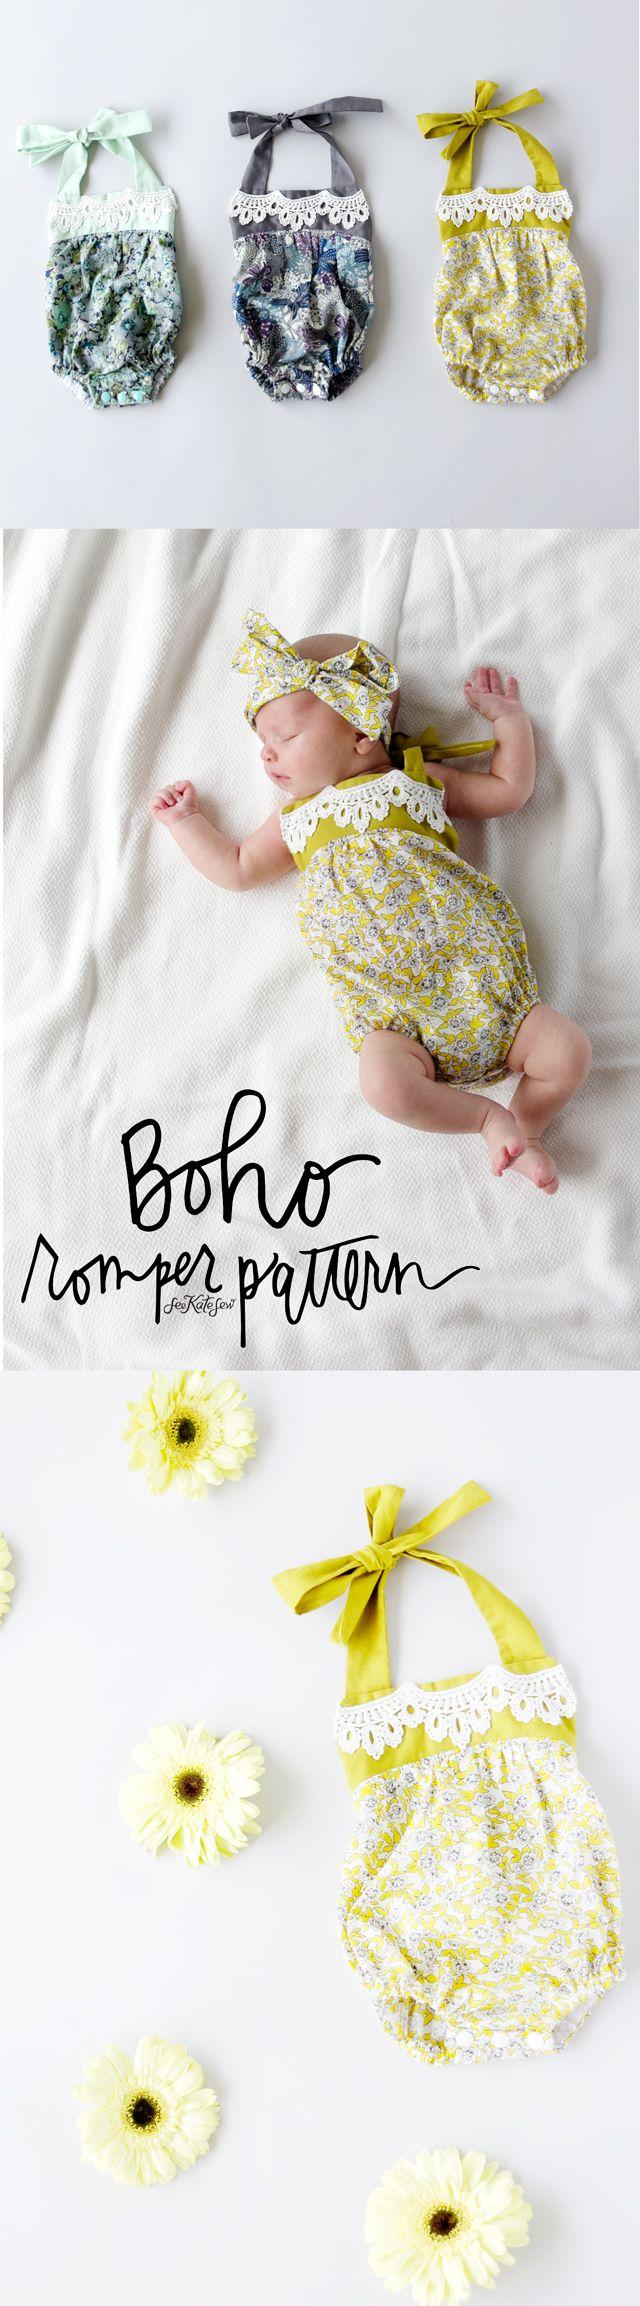 boho baby romper pattern | Schnittmuster baby, Baby strampler und ...